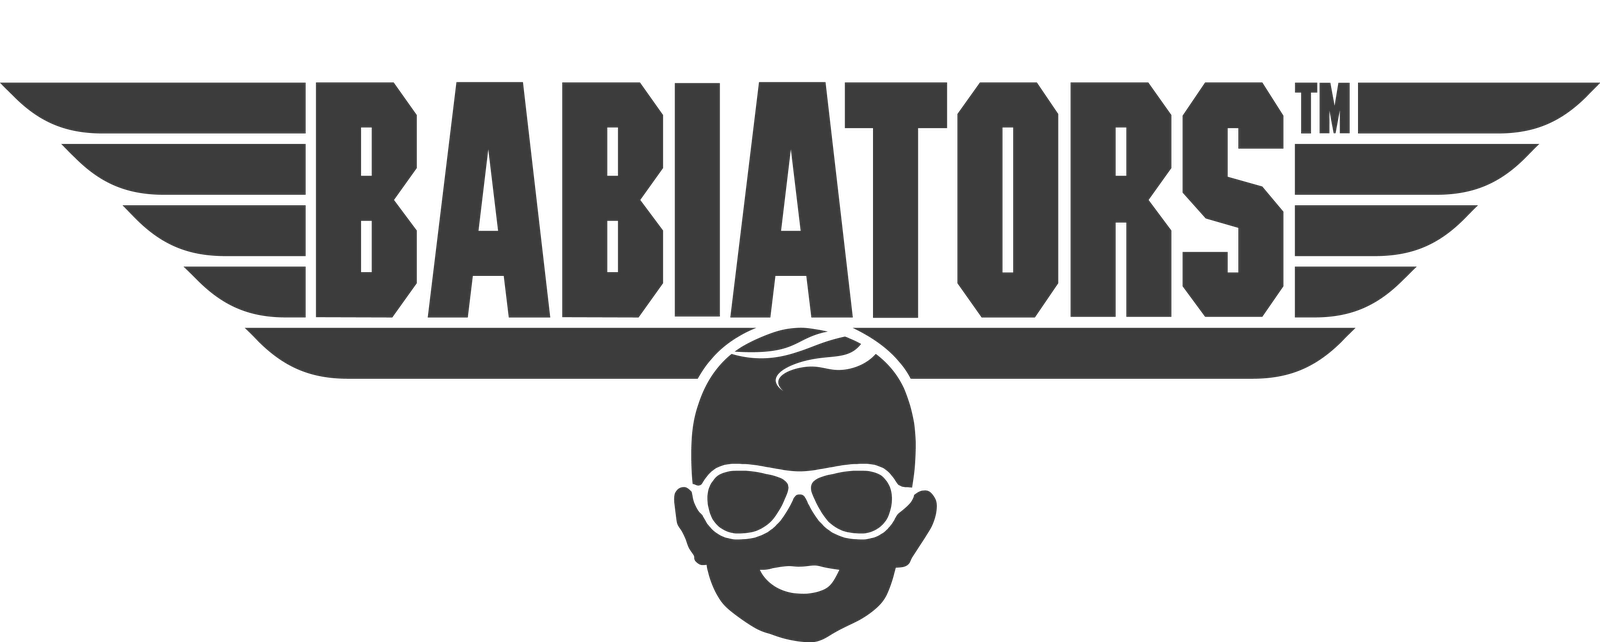 Babiators-Logo copy.png